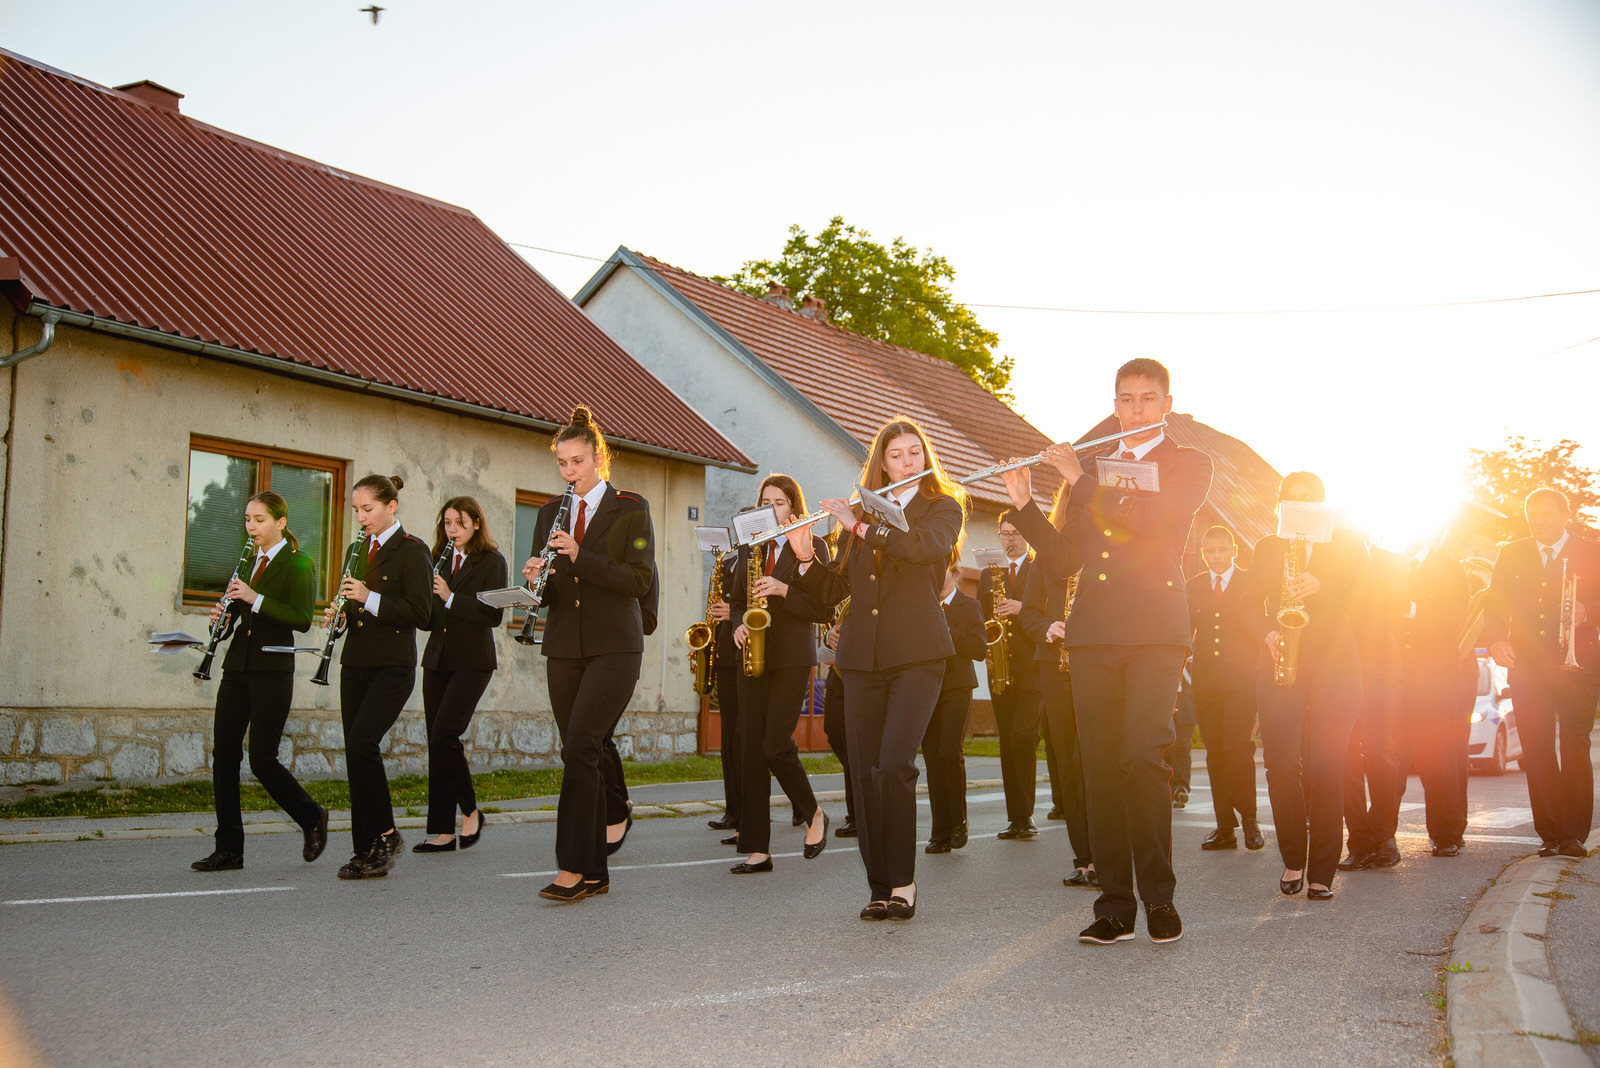 likaclub_budnica puhačkog orkestra povodom dana grada_22_7_2020 (54)